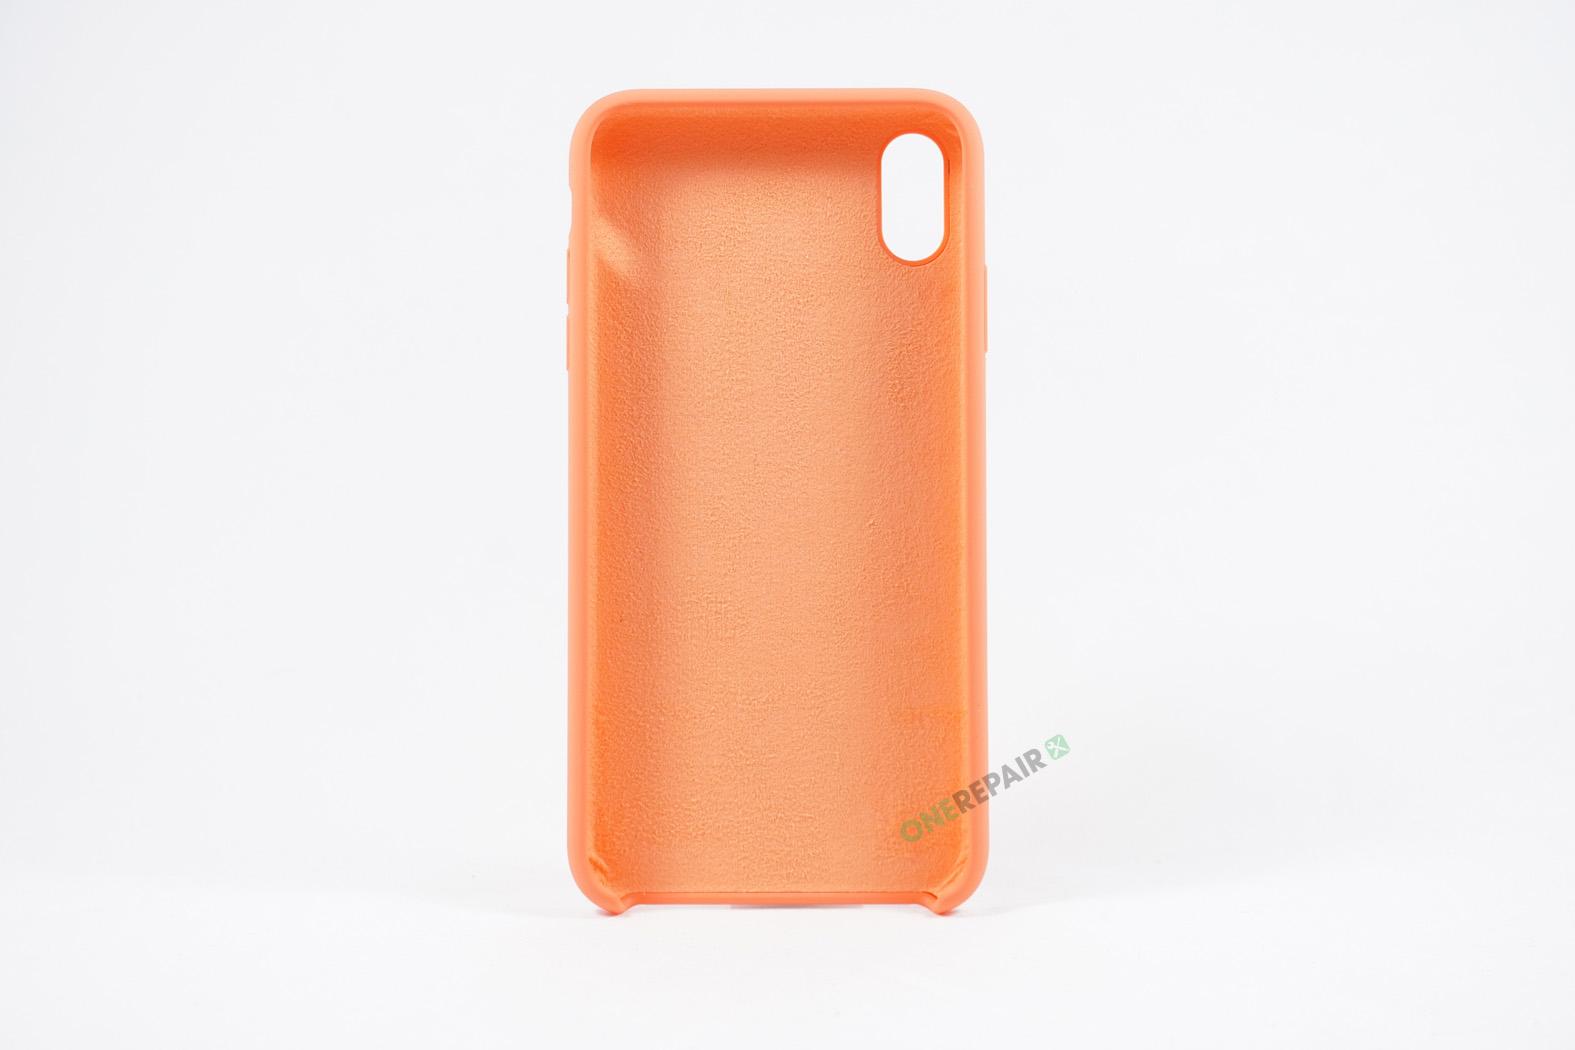 352065_iPhone_Xs_Max_Silikonecover_Cover_Orange_Pastel_OneRepair_00003